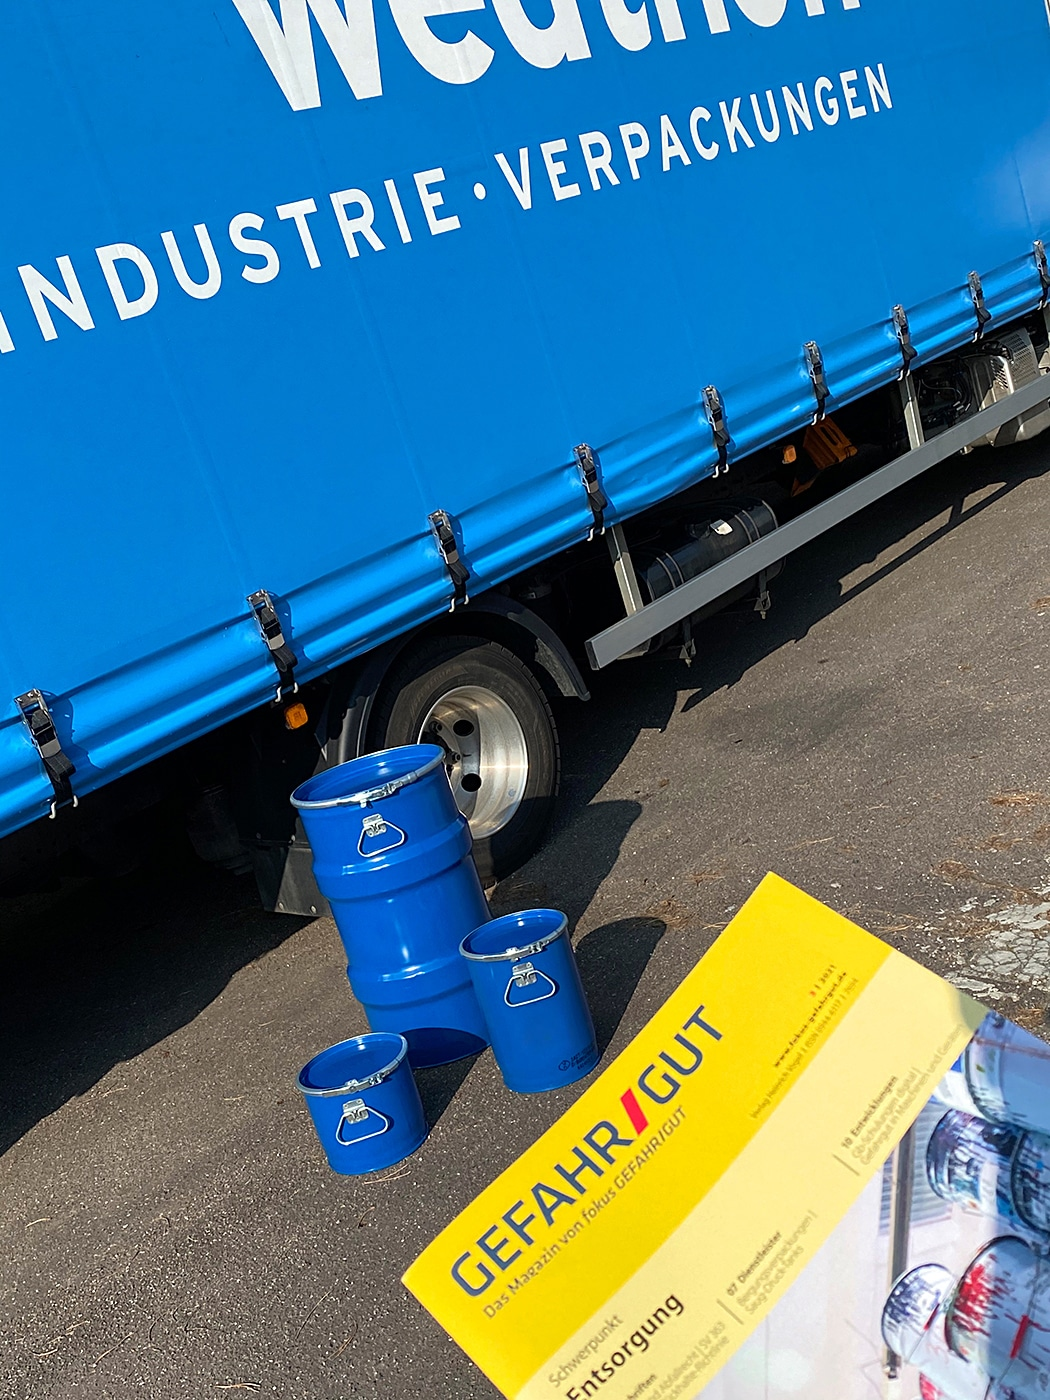 WEDTHOFF Industrieverpackungen Gefahrgutverpackungen Services +